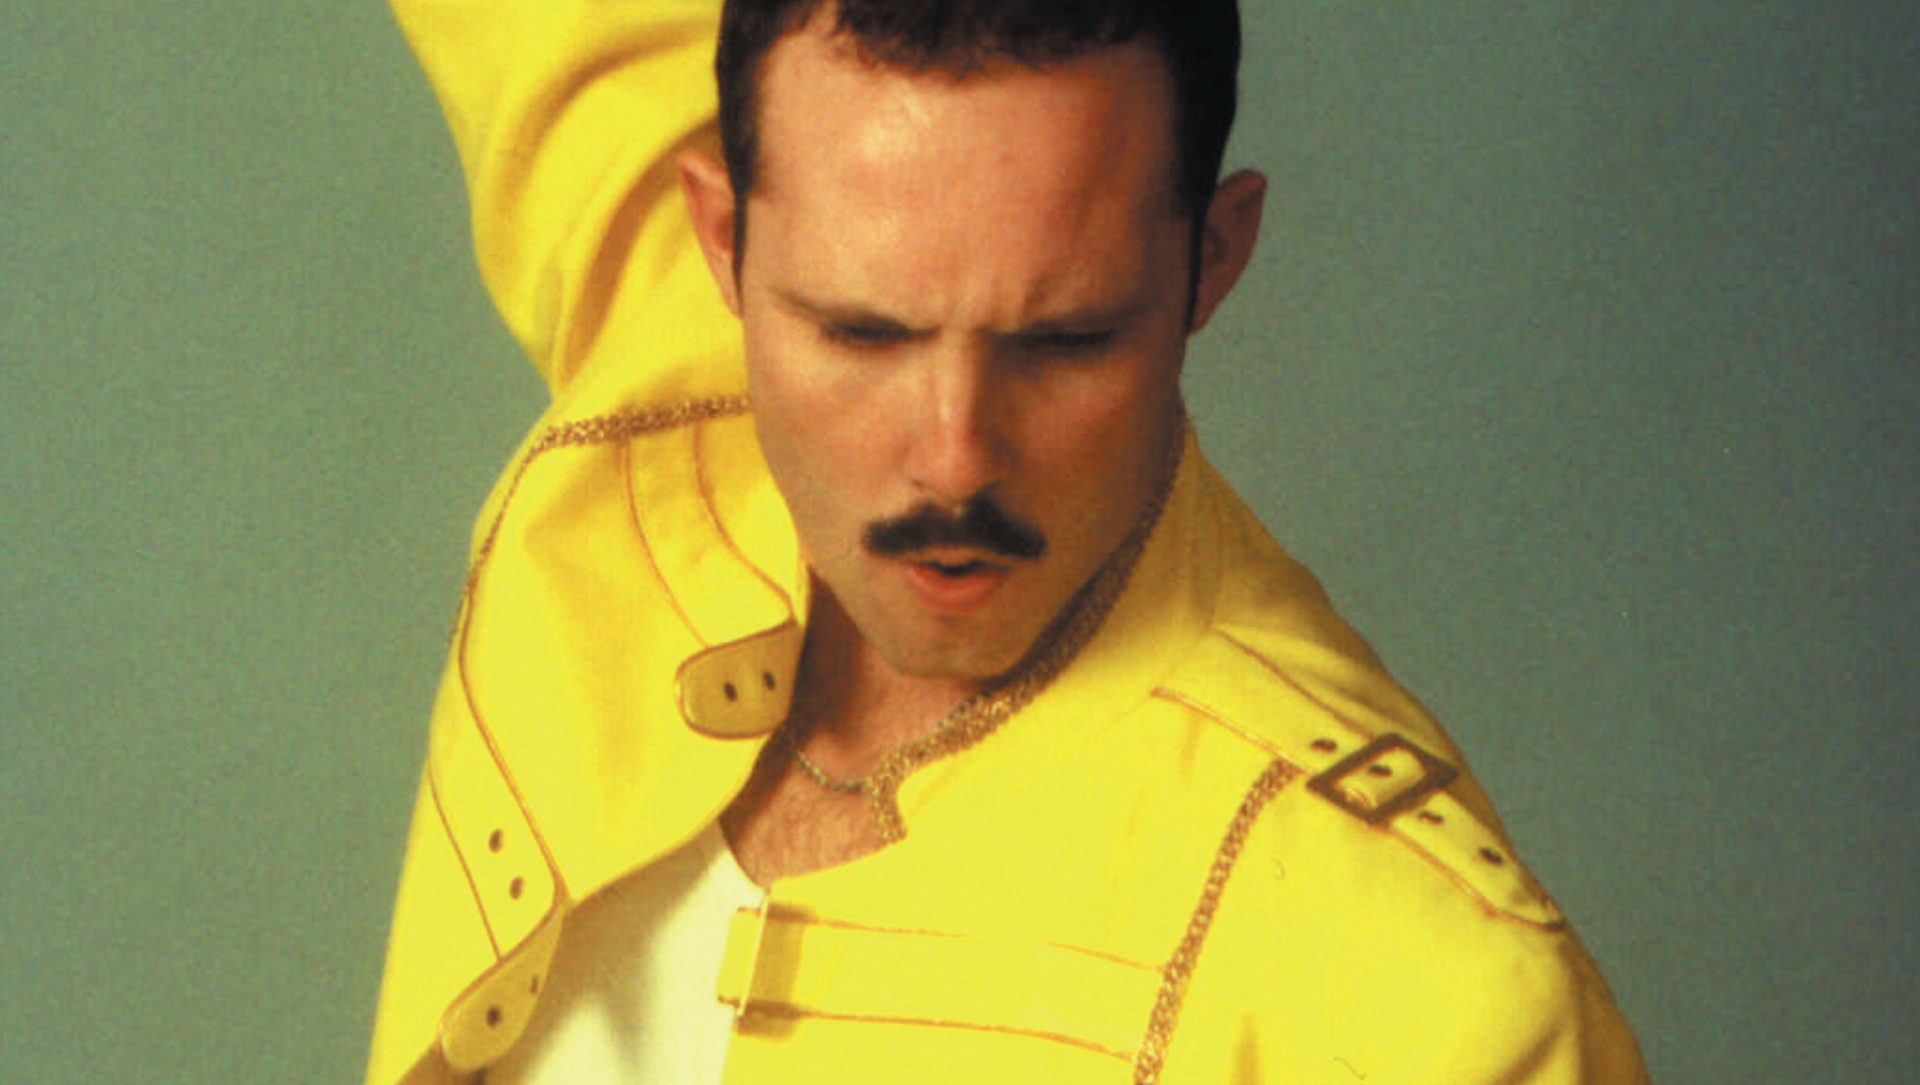 Mercury – The Ultimate Queen Tribute